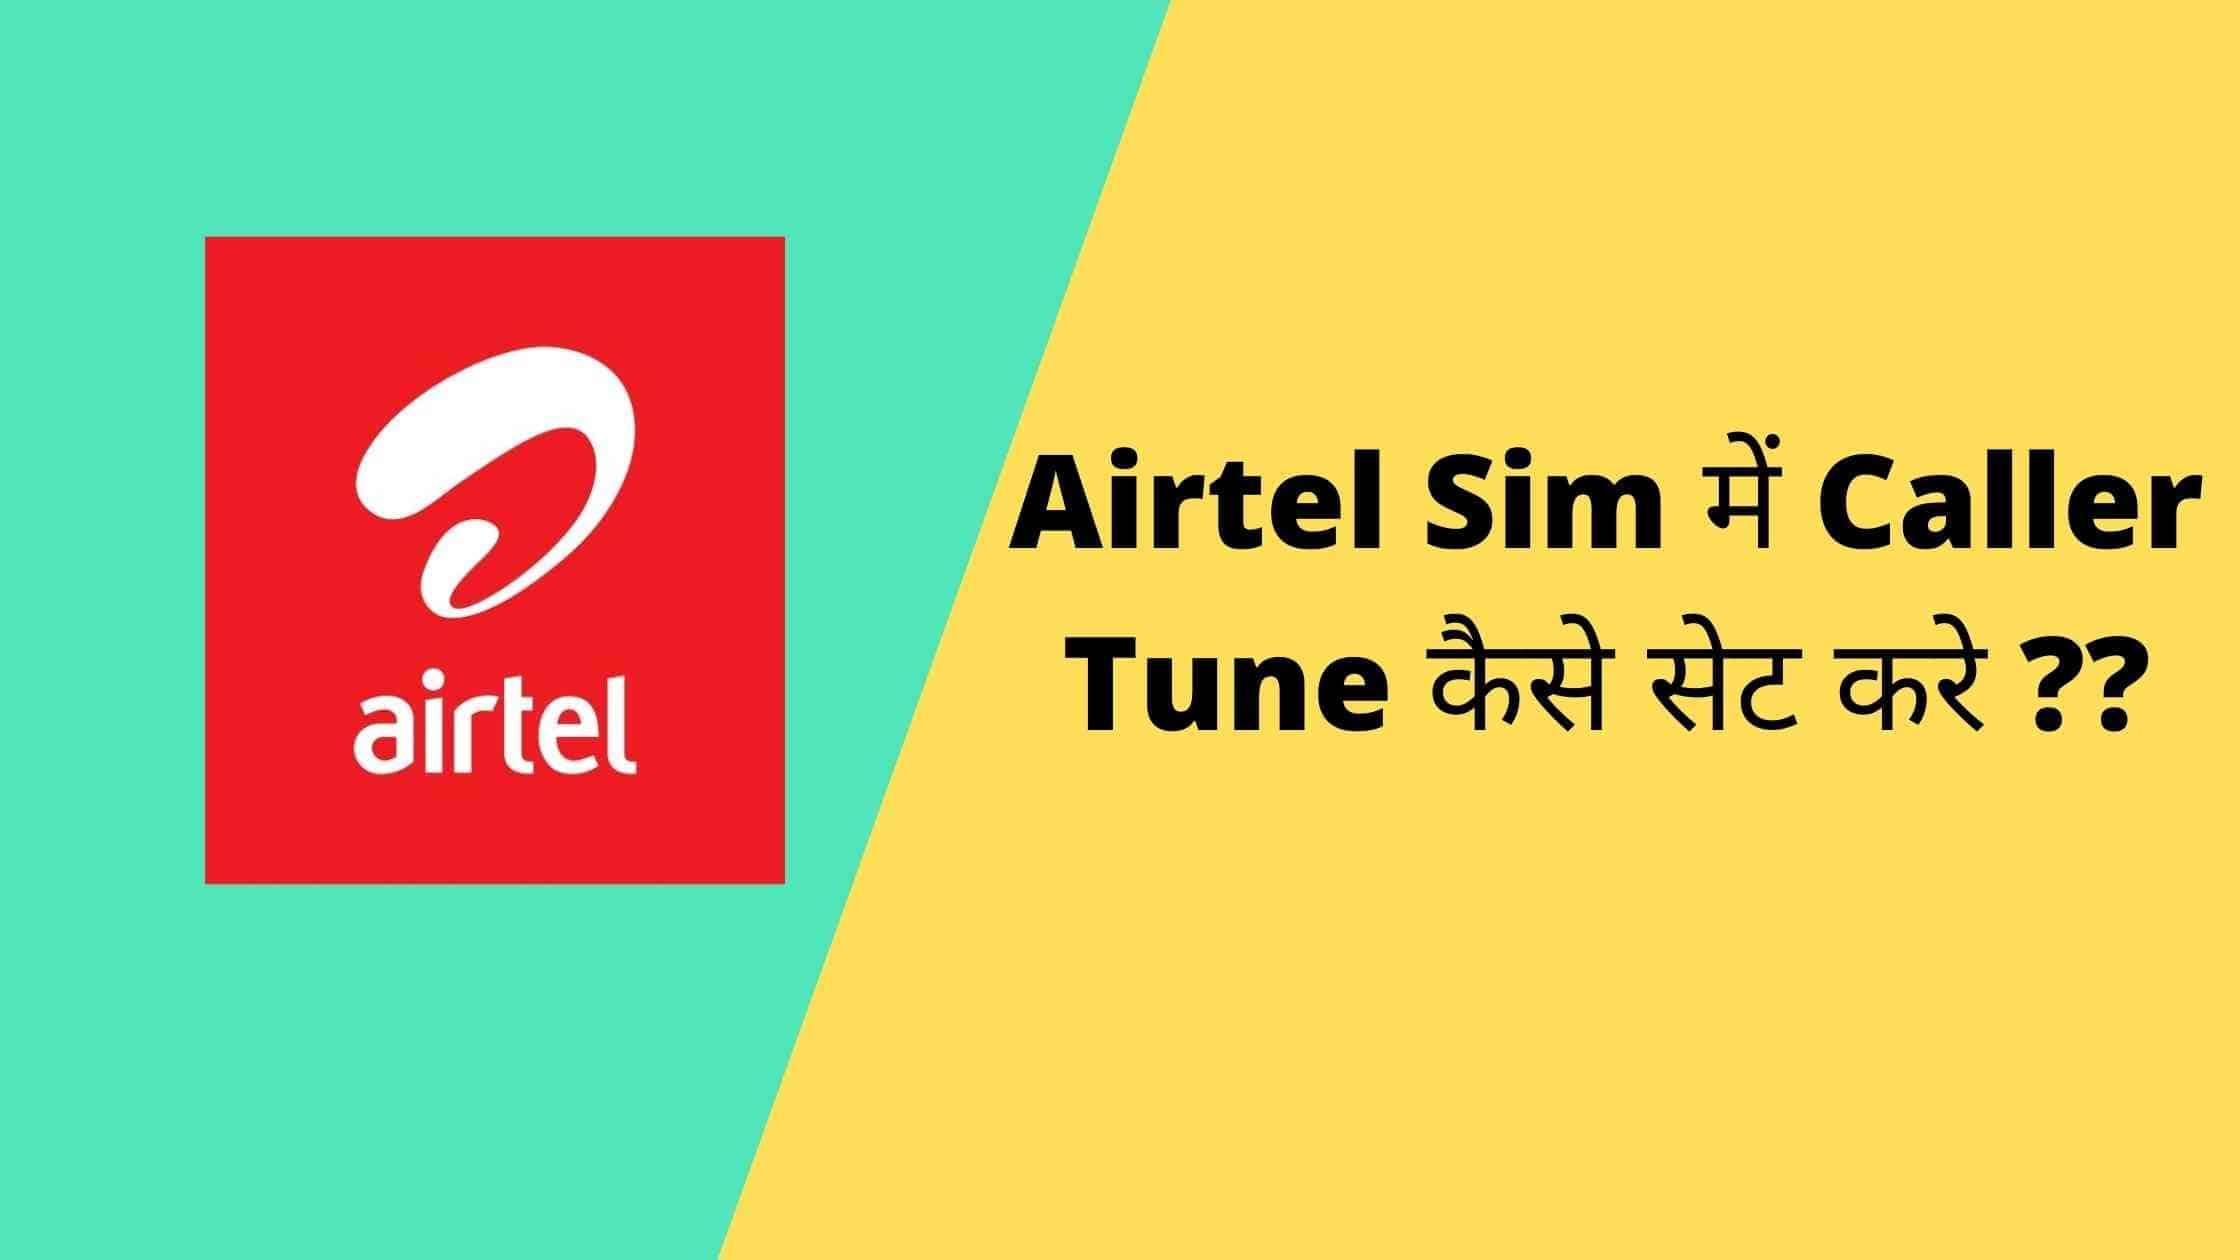 airtel sim mein caller tune kaise set kare जानिए पूरी जानकारी के साथ 2020 – New Update